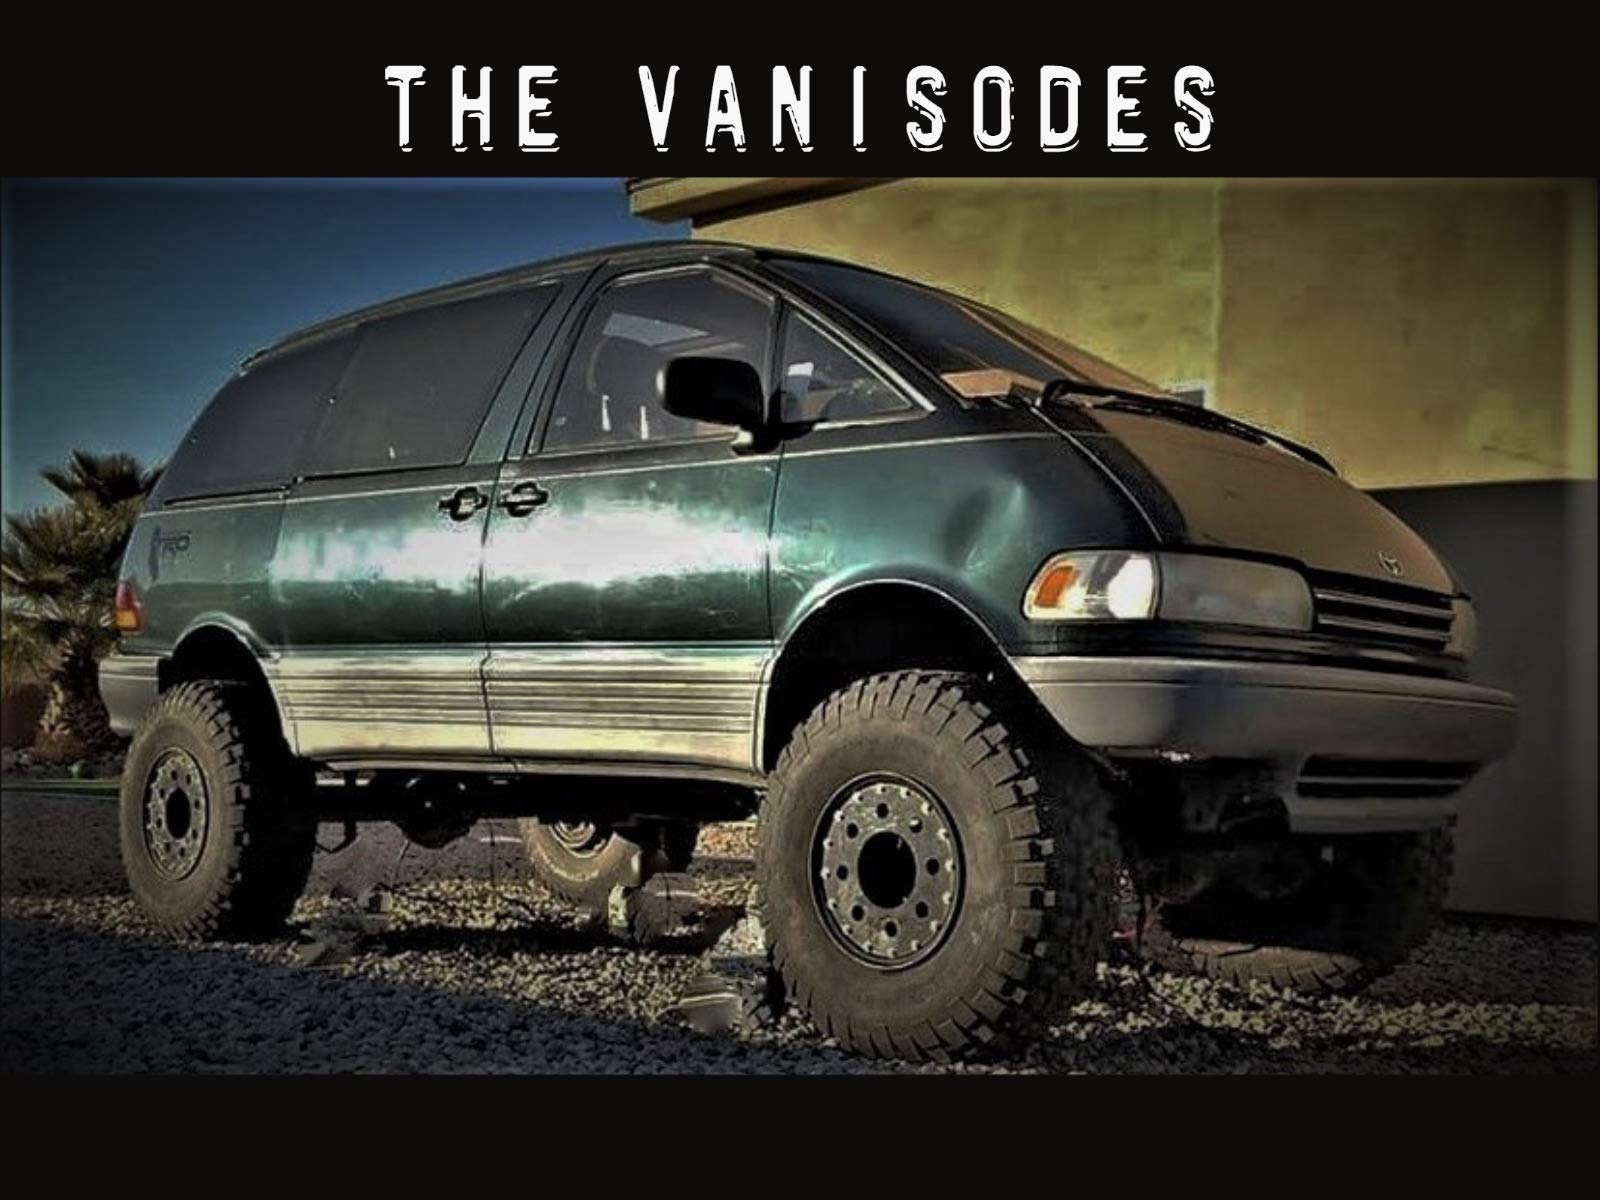 The Vanisodes - Season 1